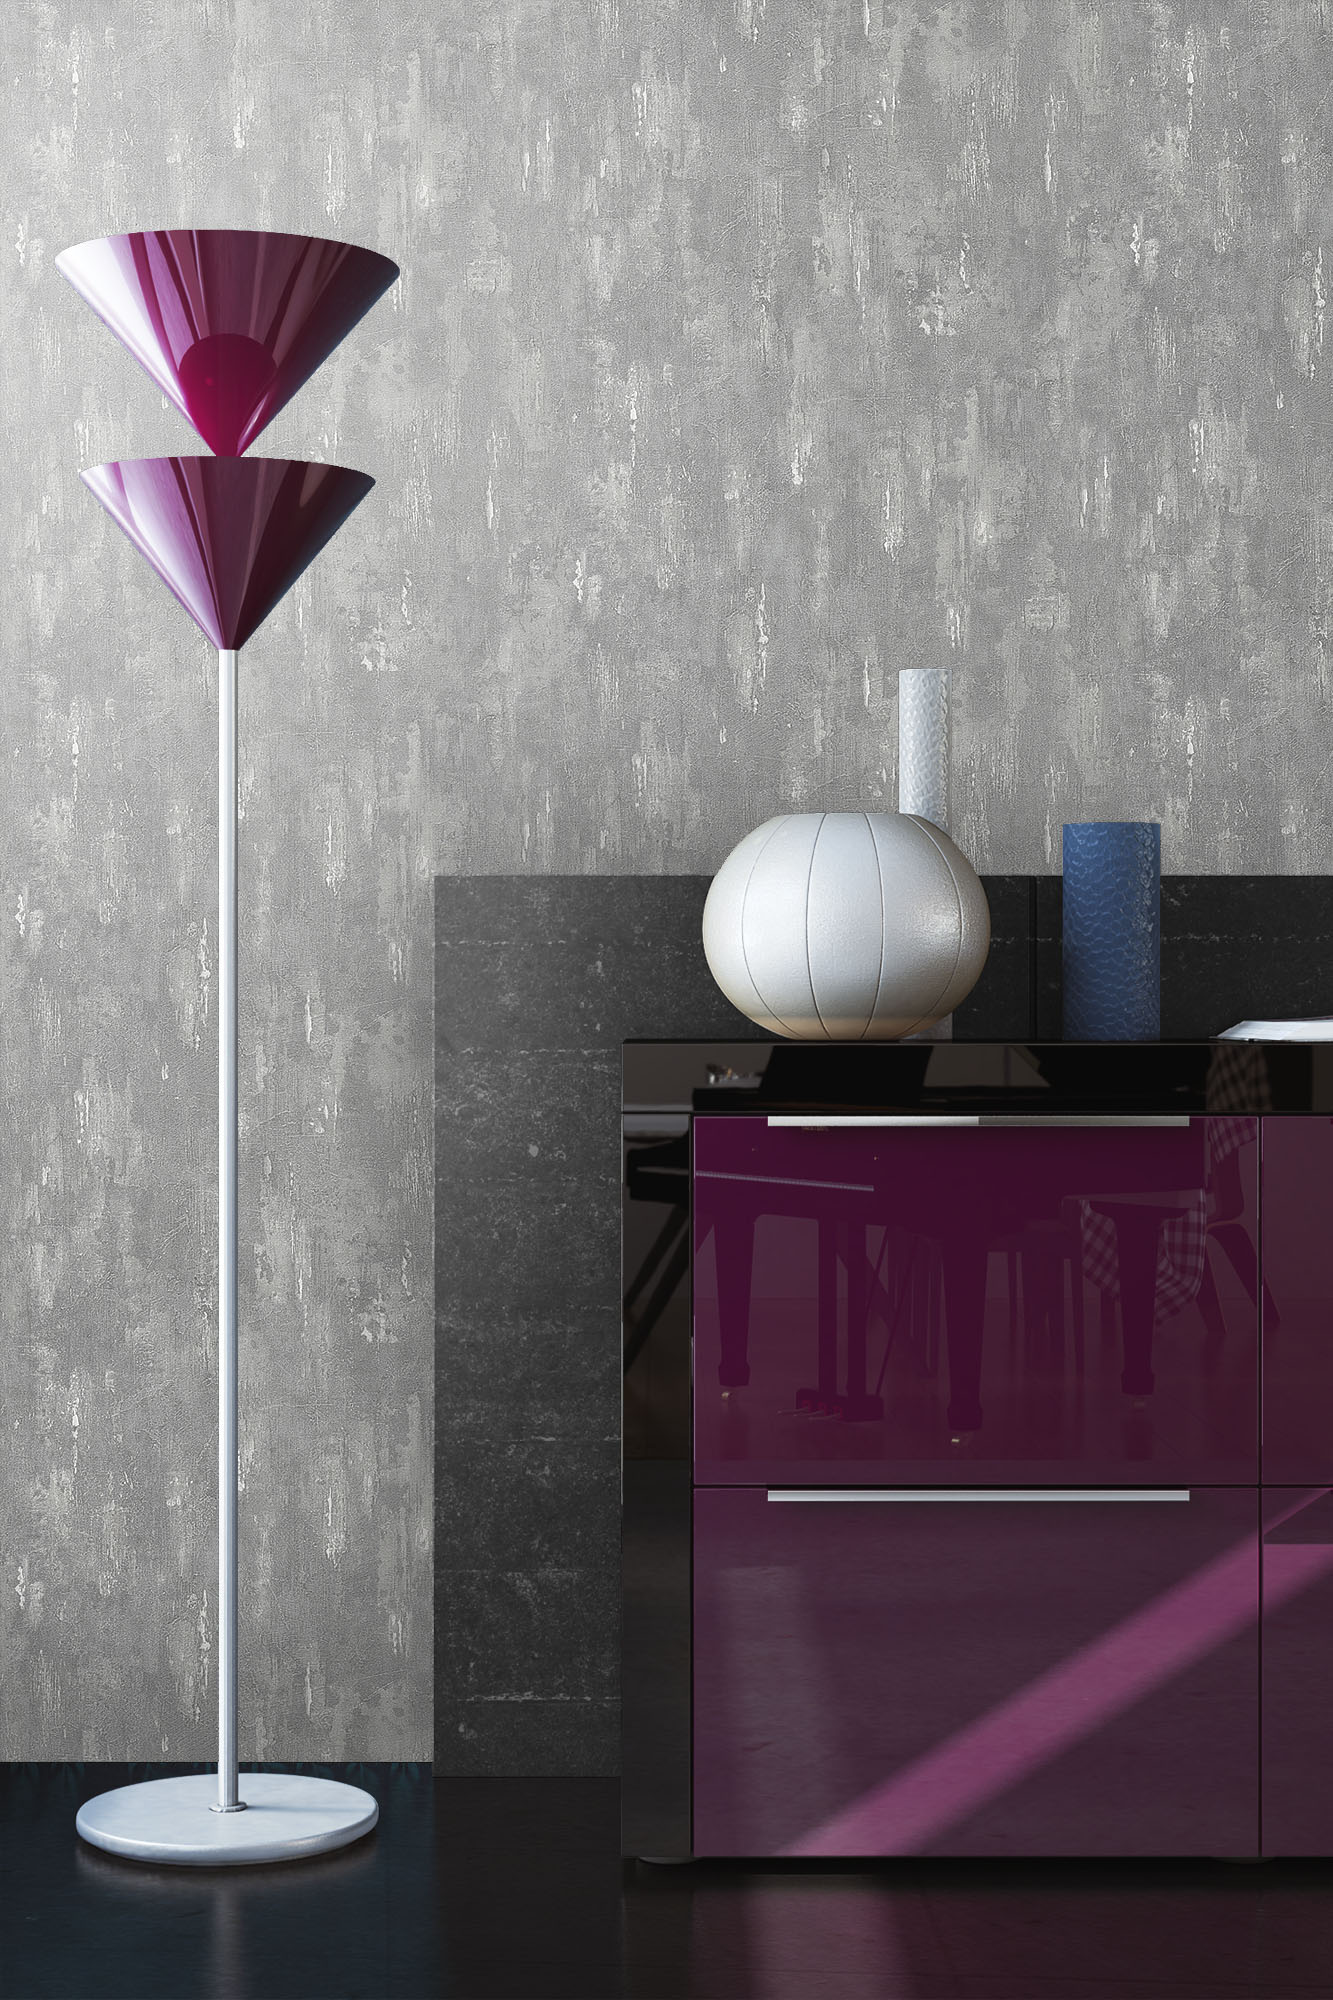 Tapete vlies stein beton grau steinwand putz metall optik